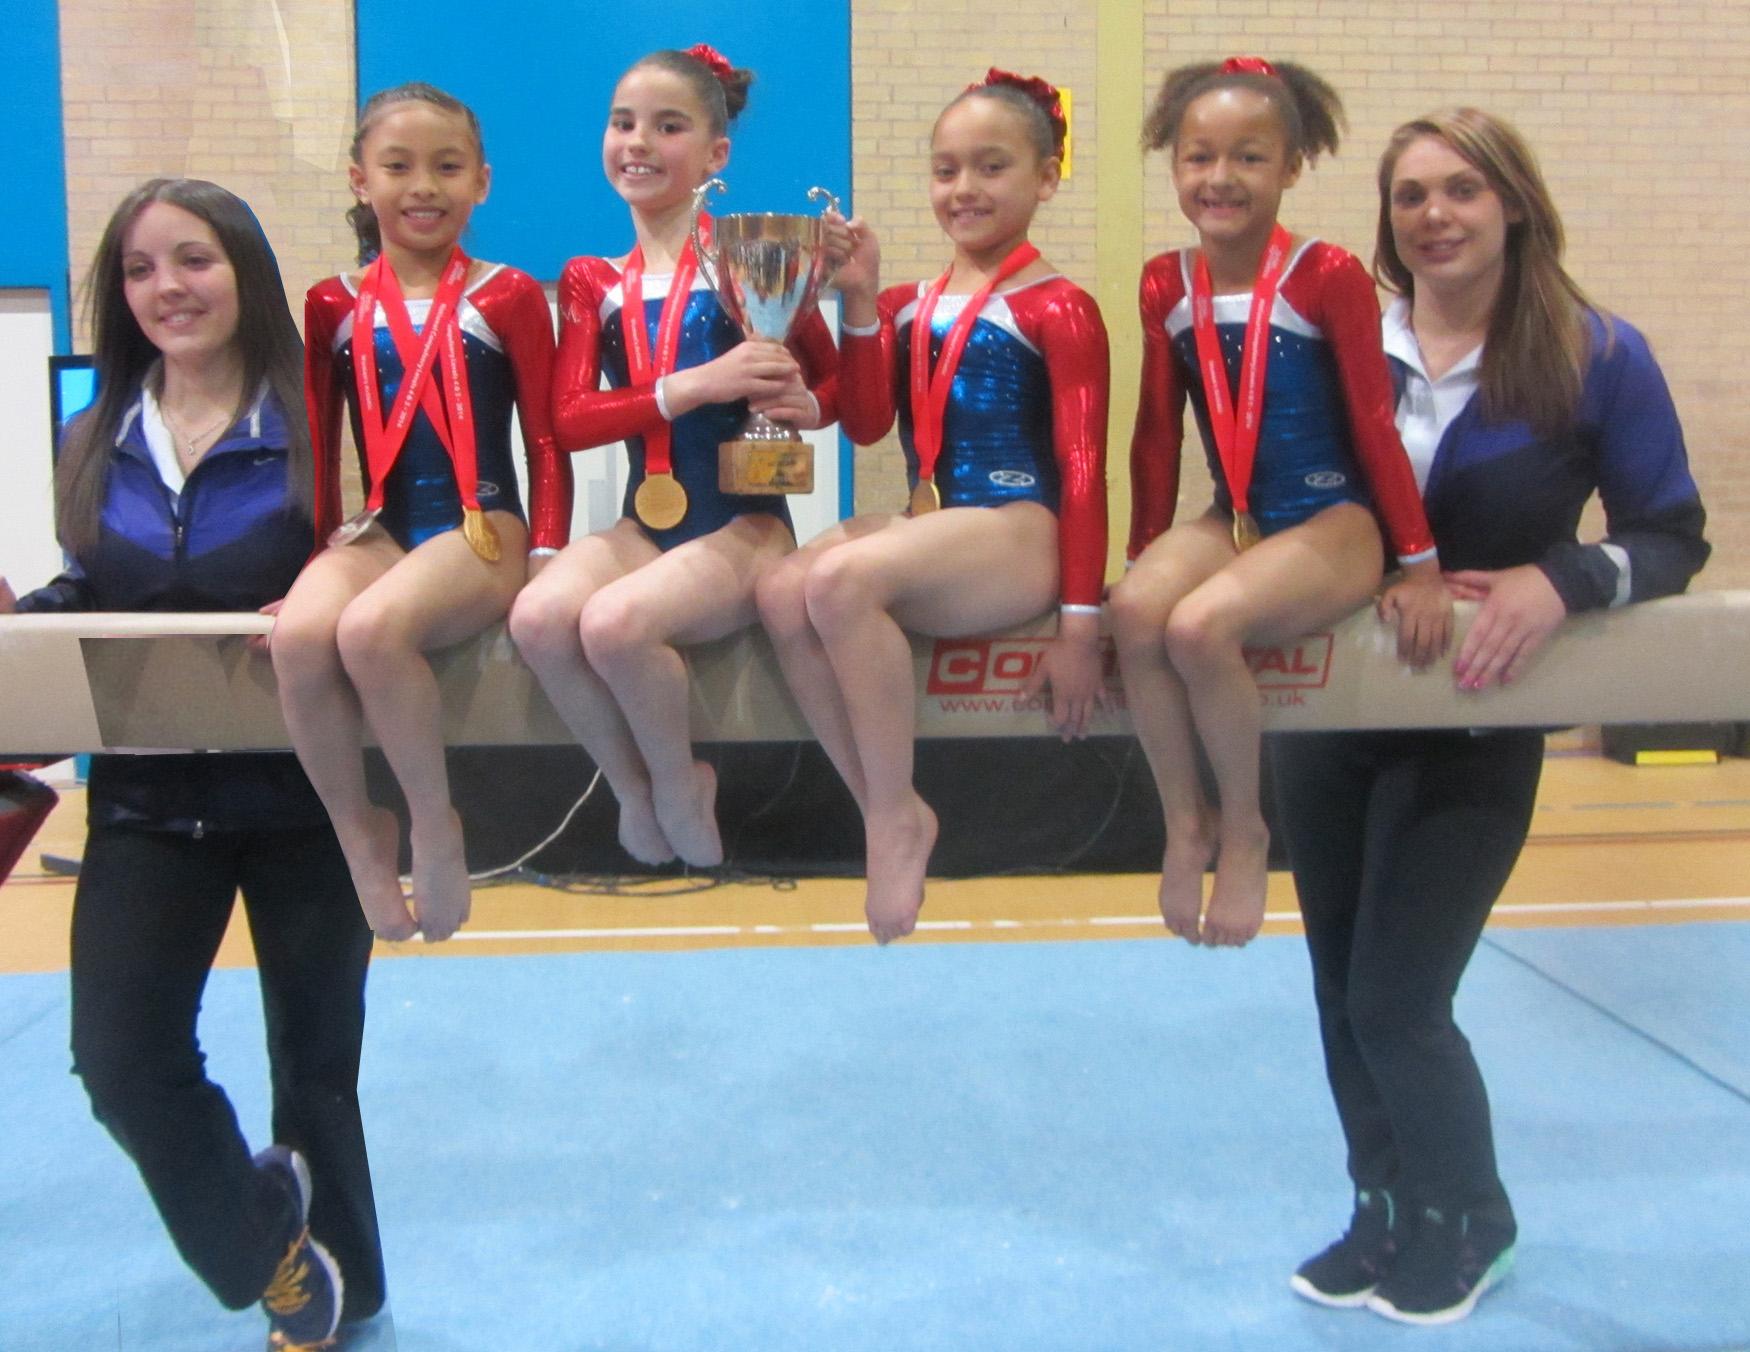 Krystie Newton, Coach, Sophia C, Amelia, Sophia M, Miriam and Jody Kime, Coach